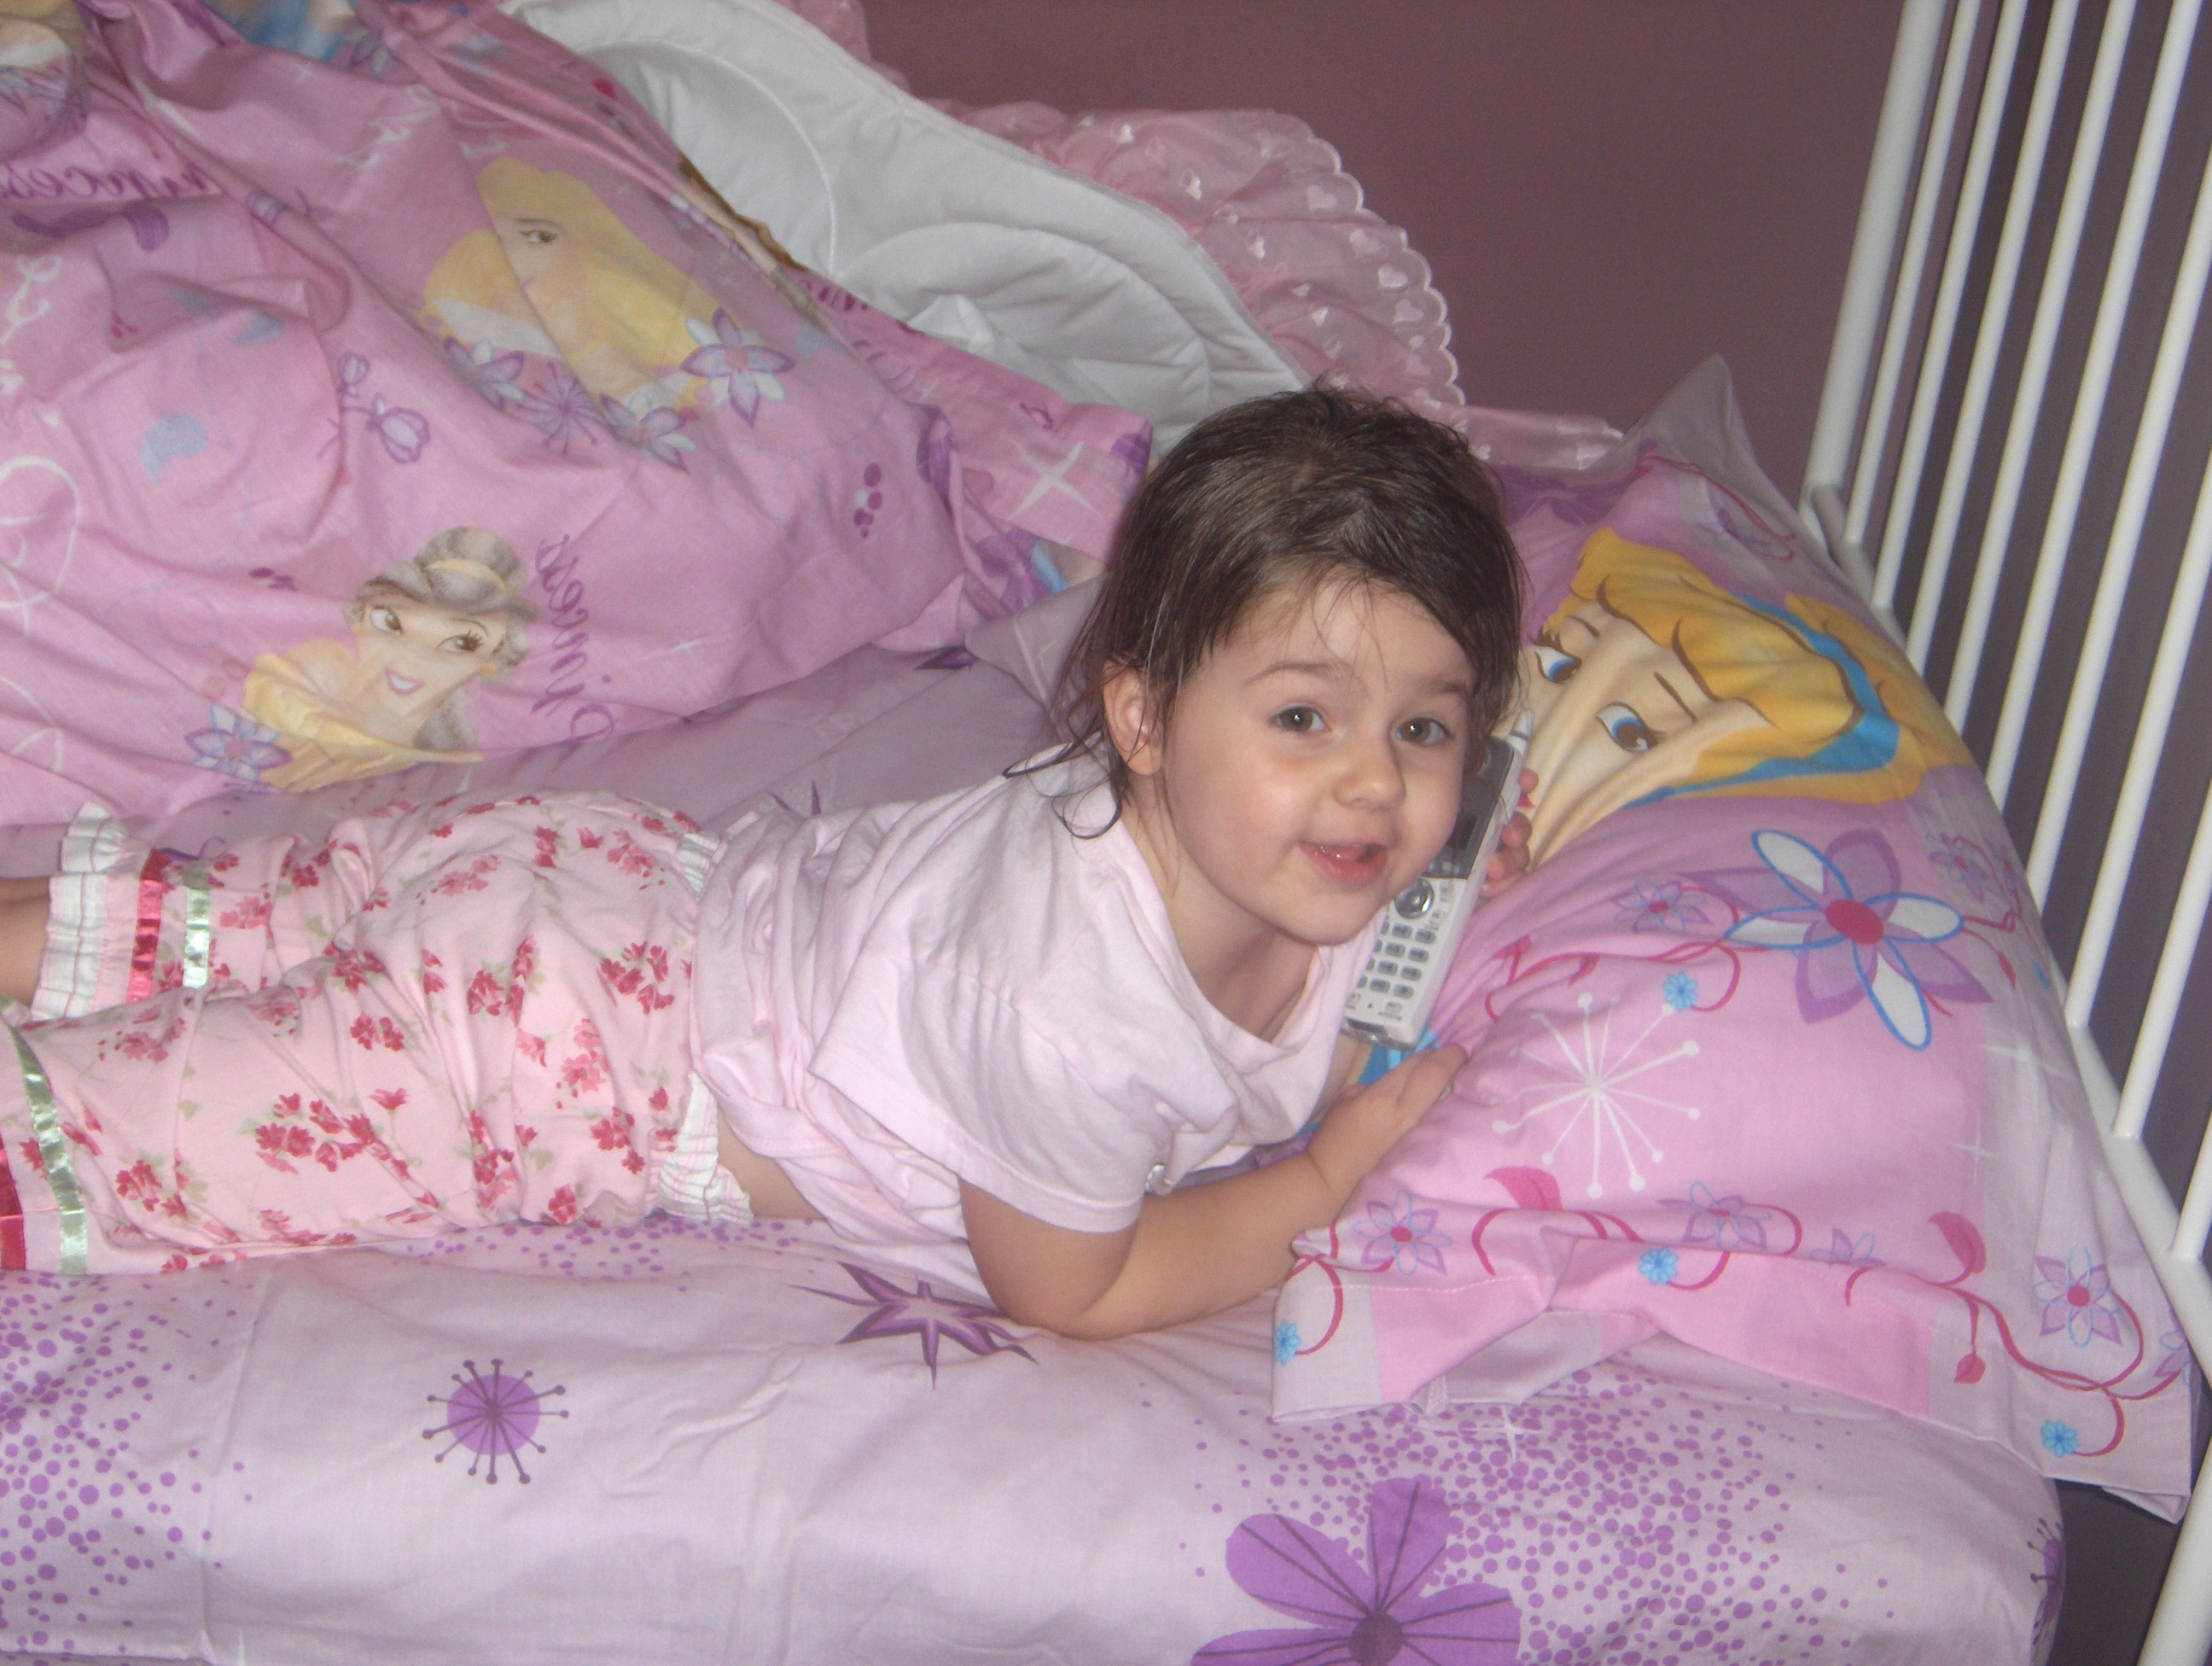 little girl in bed images   usseek com. girl in bed images   usseek com